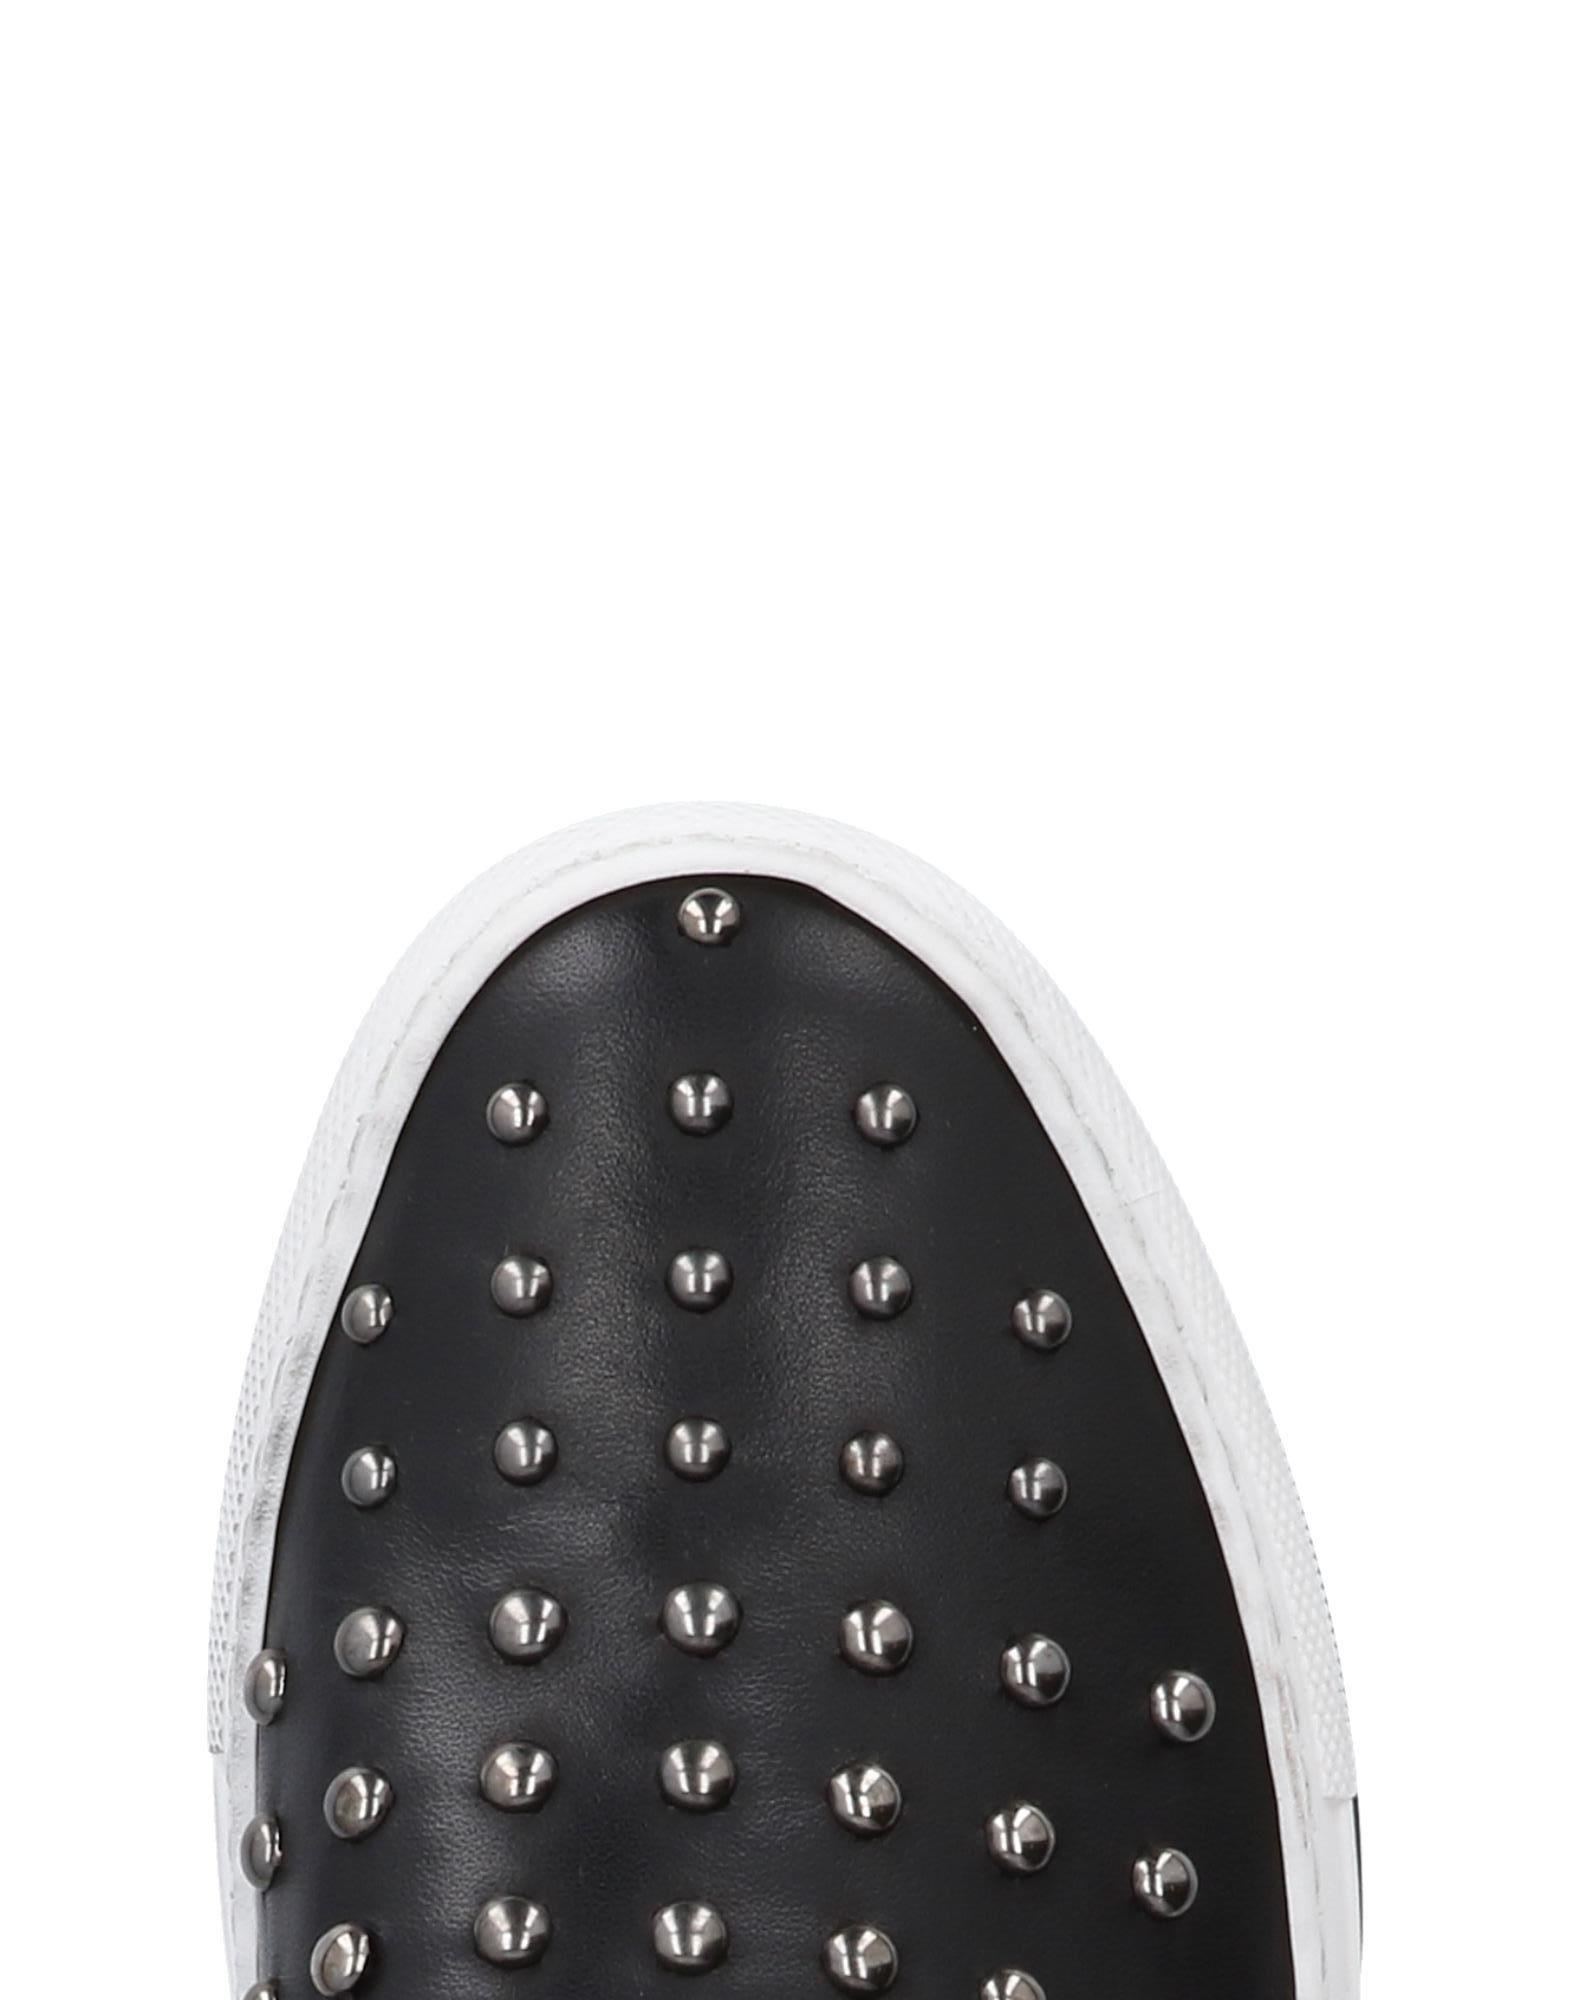 Gut Pettinari um billige Schuhe zu tragenLoretta Pettinari Gut Sneakers Damen  11493926JV 855586